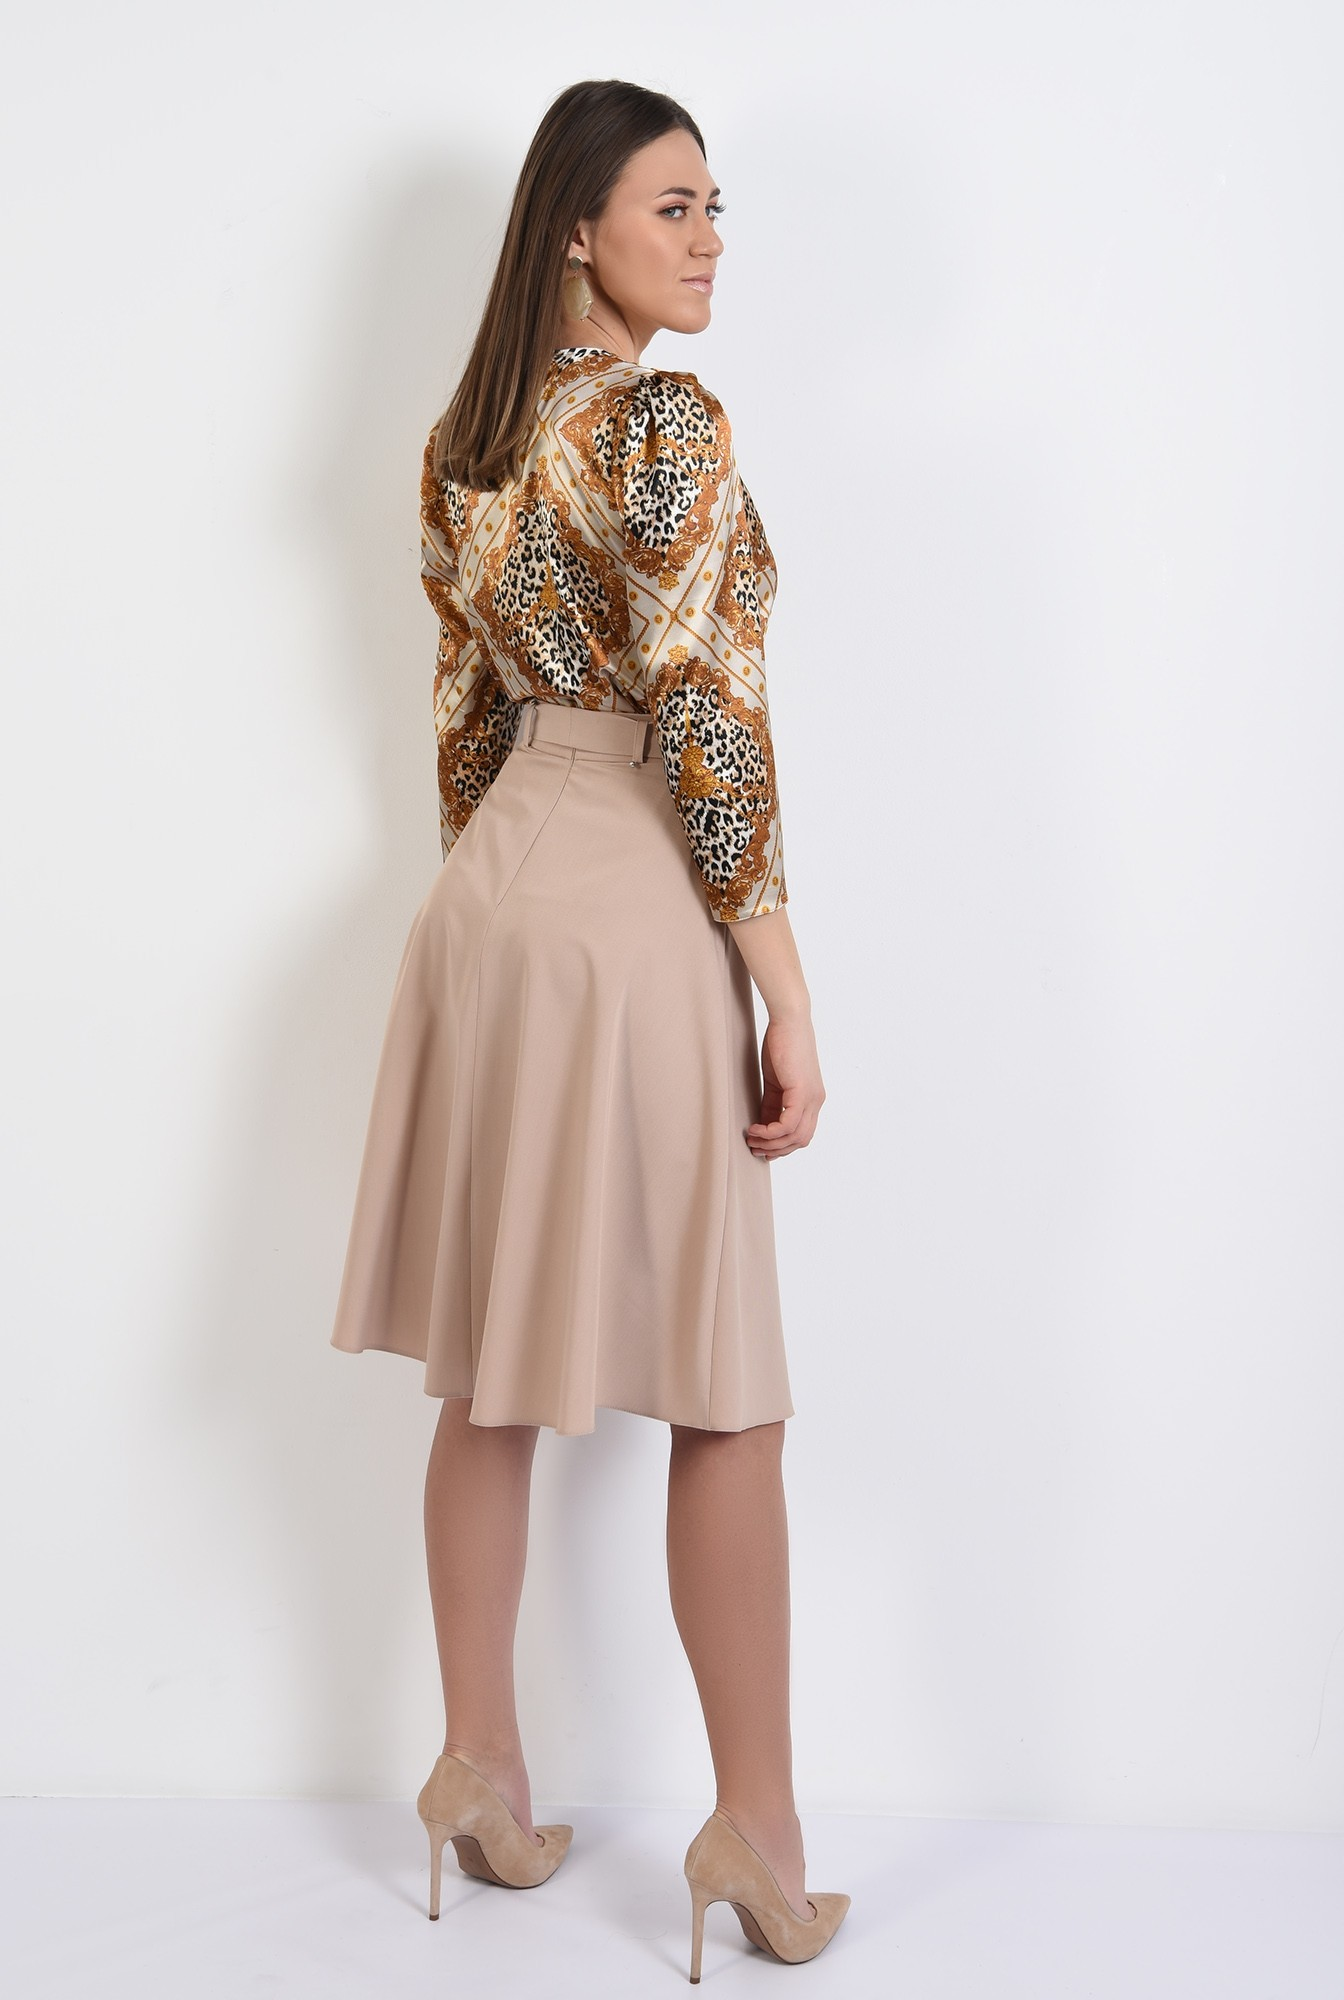 1 - bluza eleganta, din satin, cu imprimeu, animal print, bluza de primavara